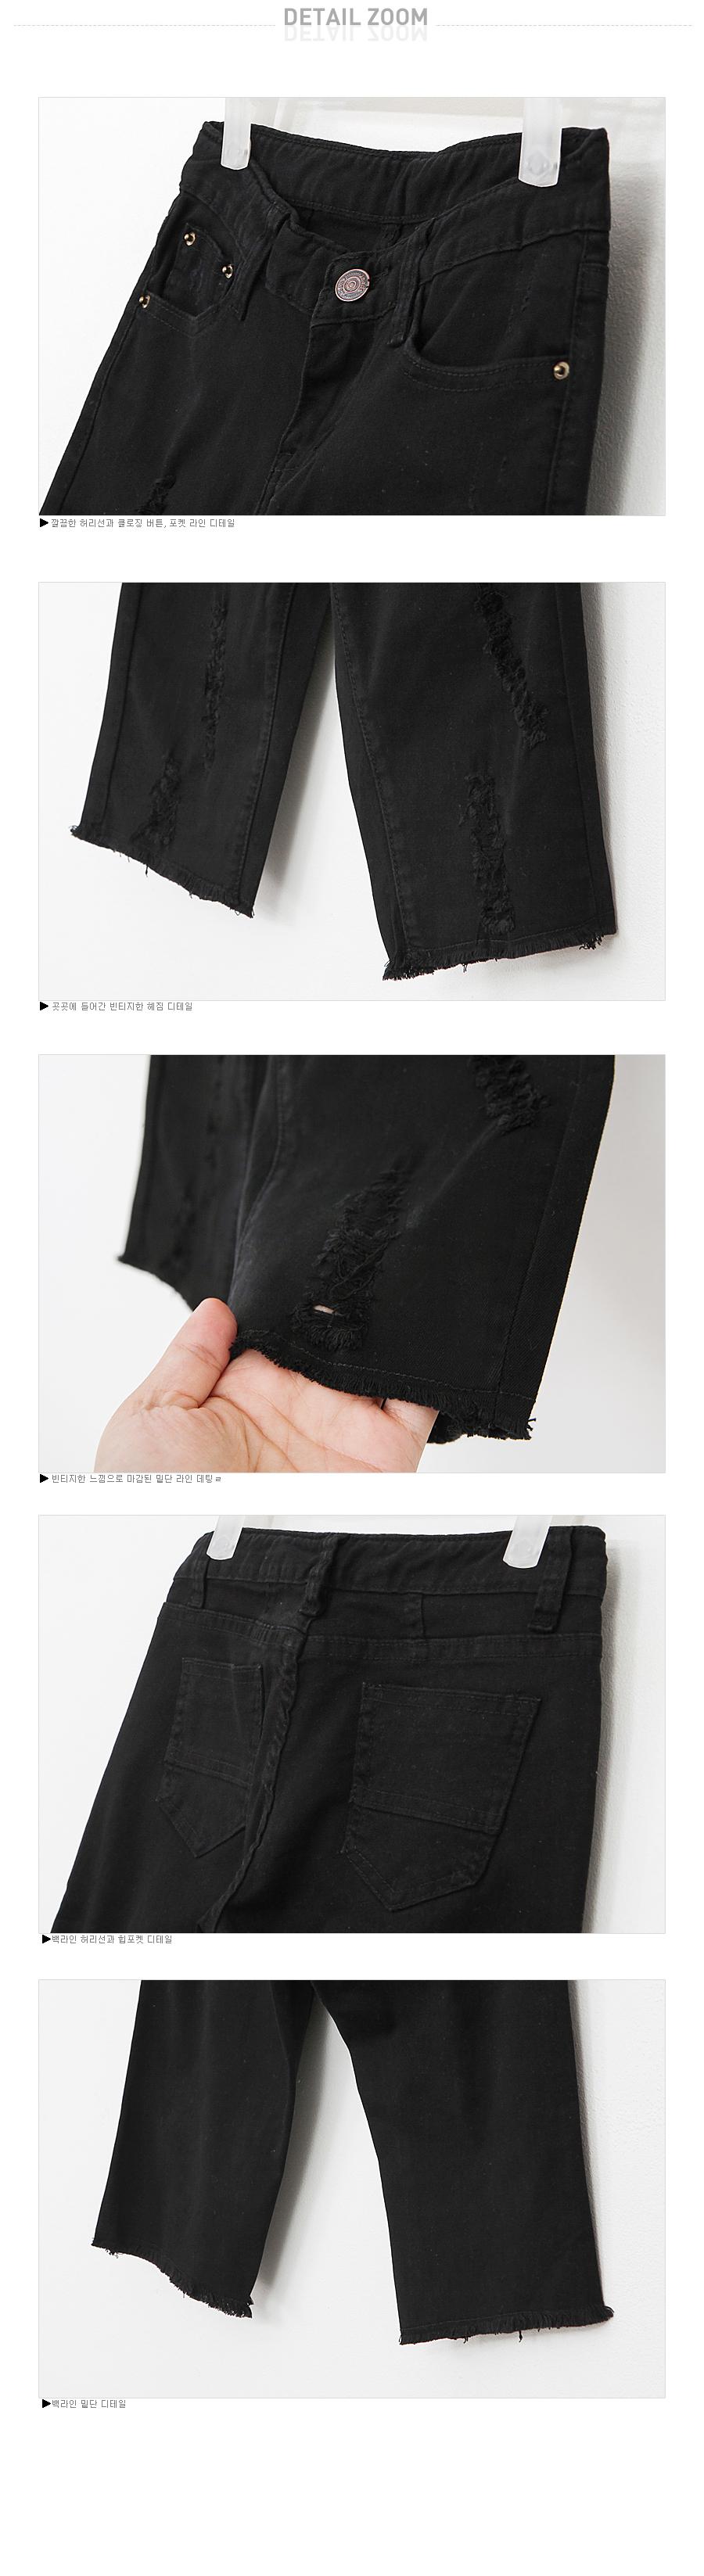 Kotiv Vintage Cut Slim Pants #71363